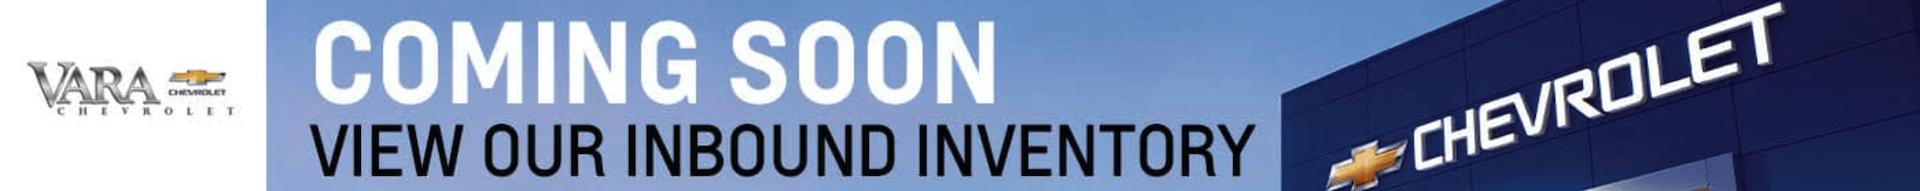 Vara Chevrolet Coming Soon Inbound Inventory banner